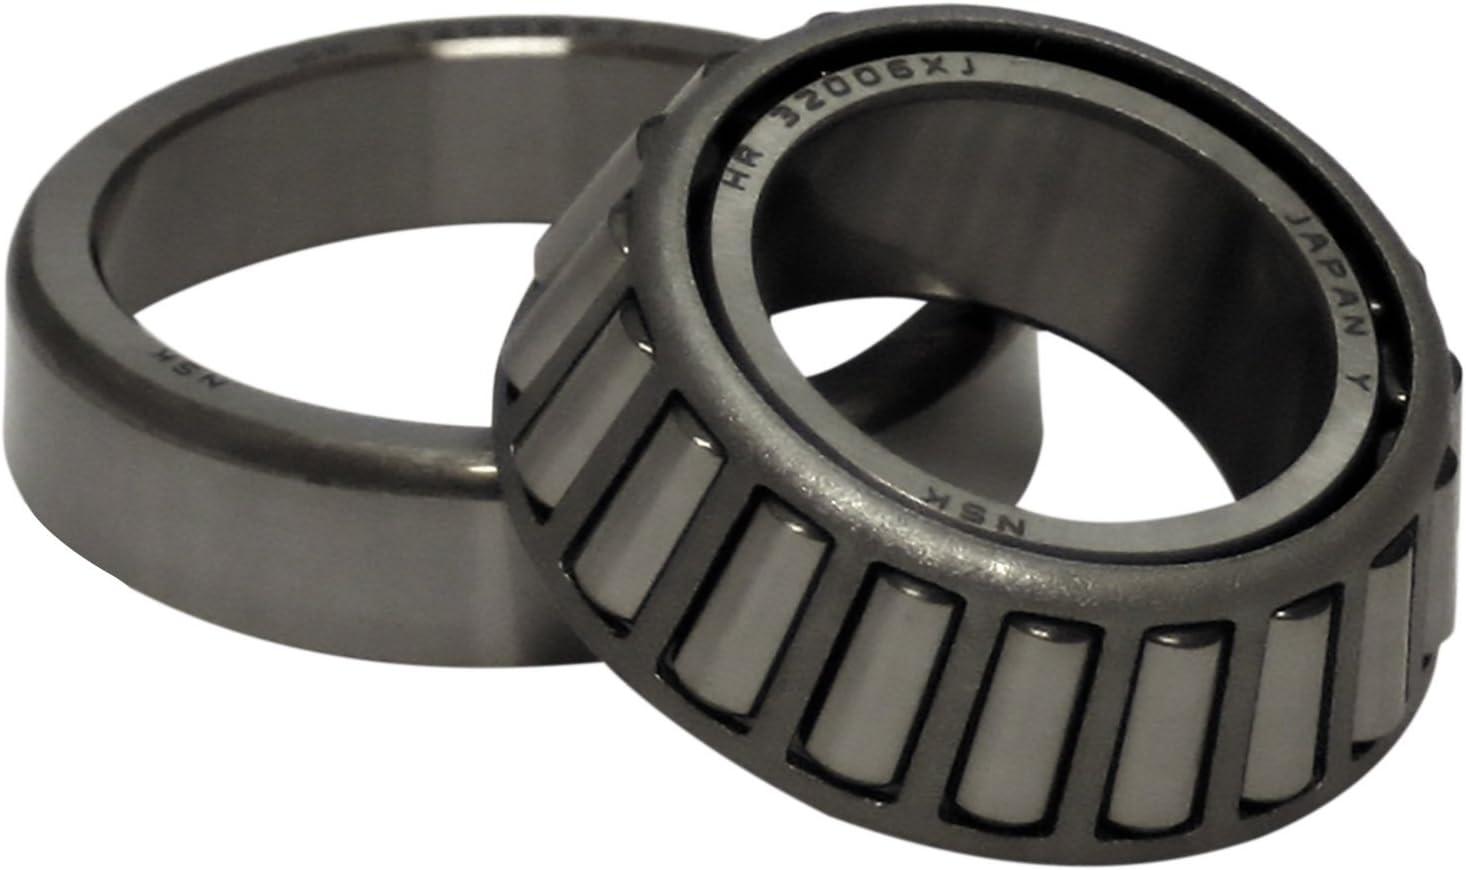 NSK 32006XJ Wheel Bearing 1 Pack